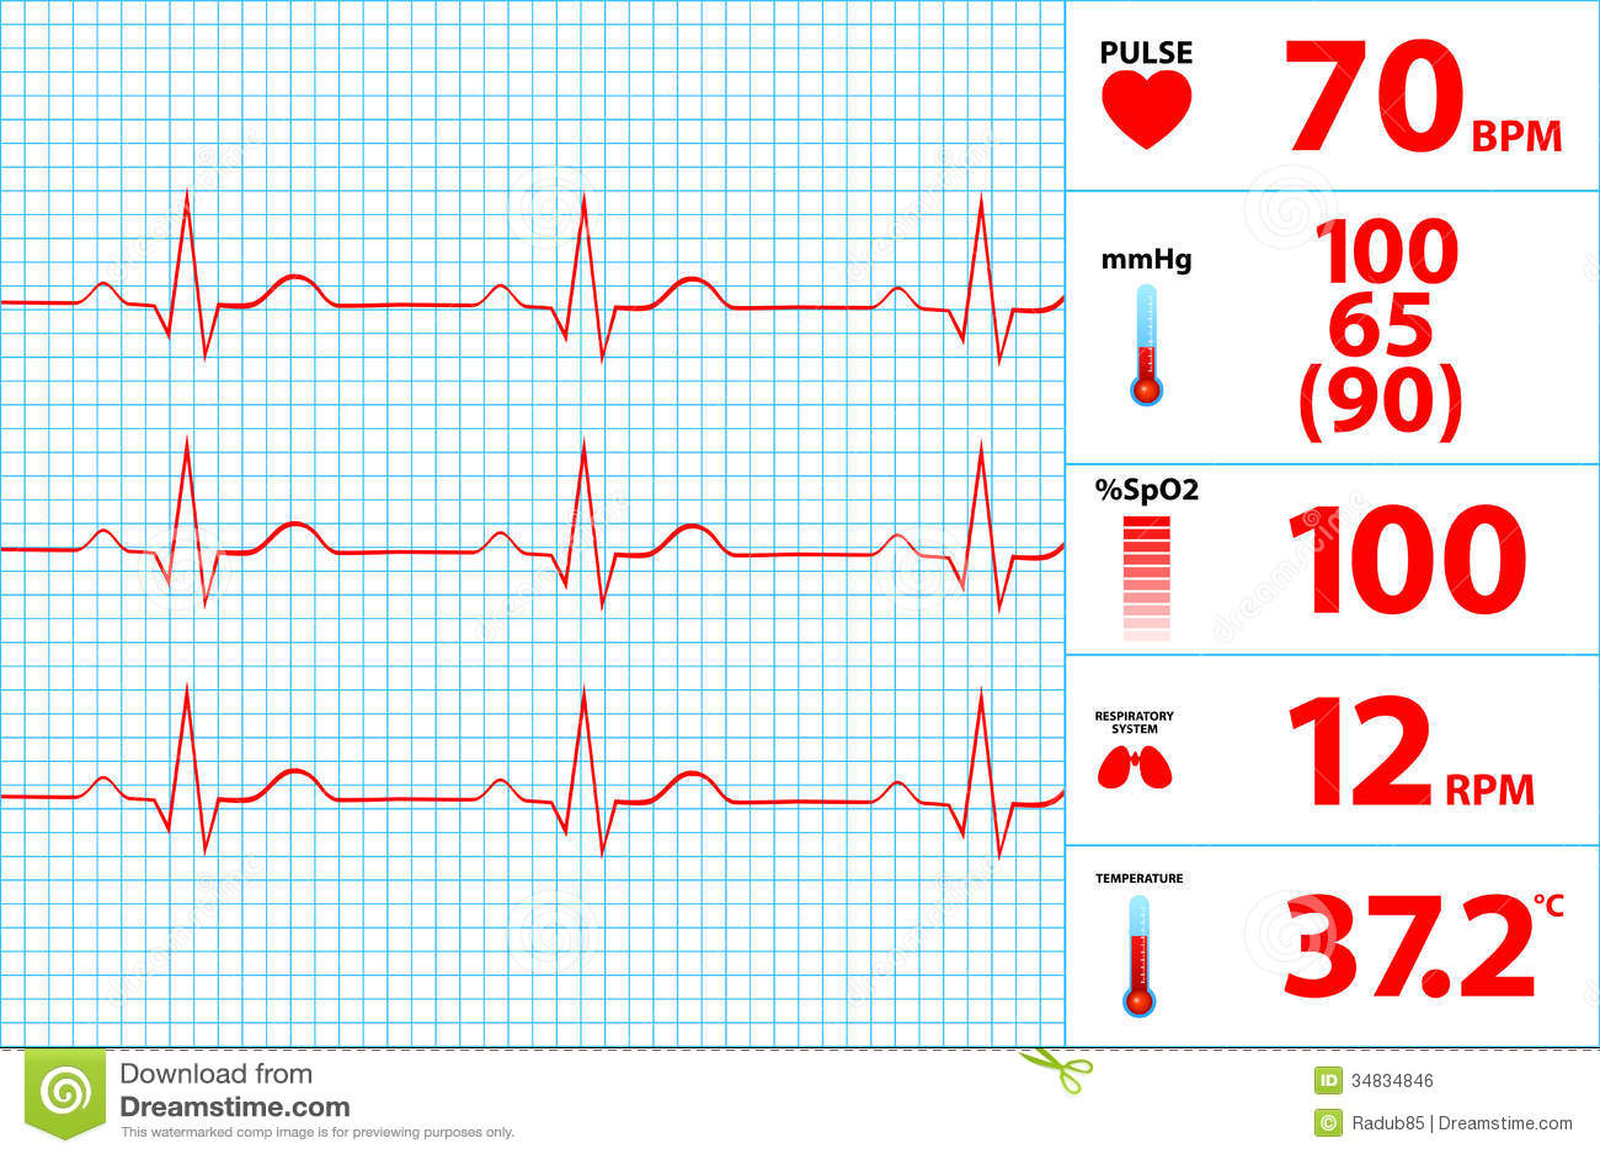 modern electrocardiogram monitor display stock vector ekg vector leads ekg vector srca objasnjenje